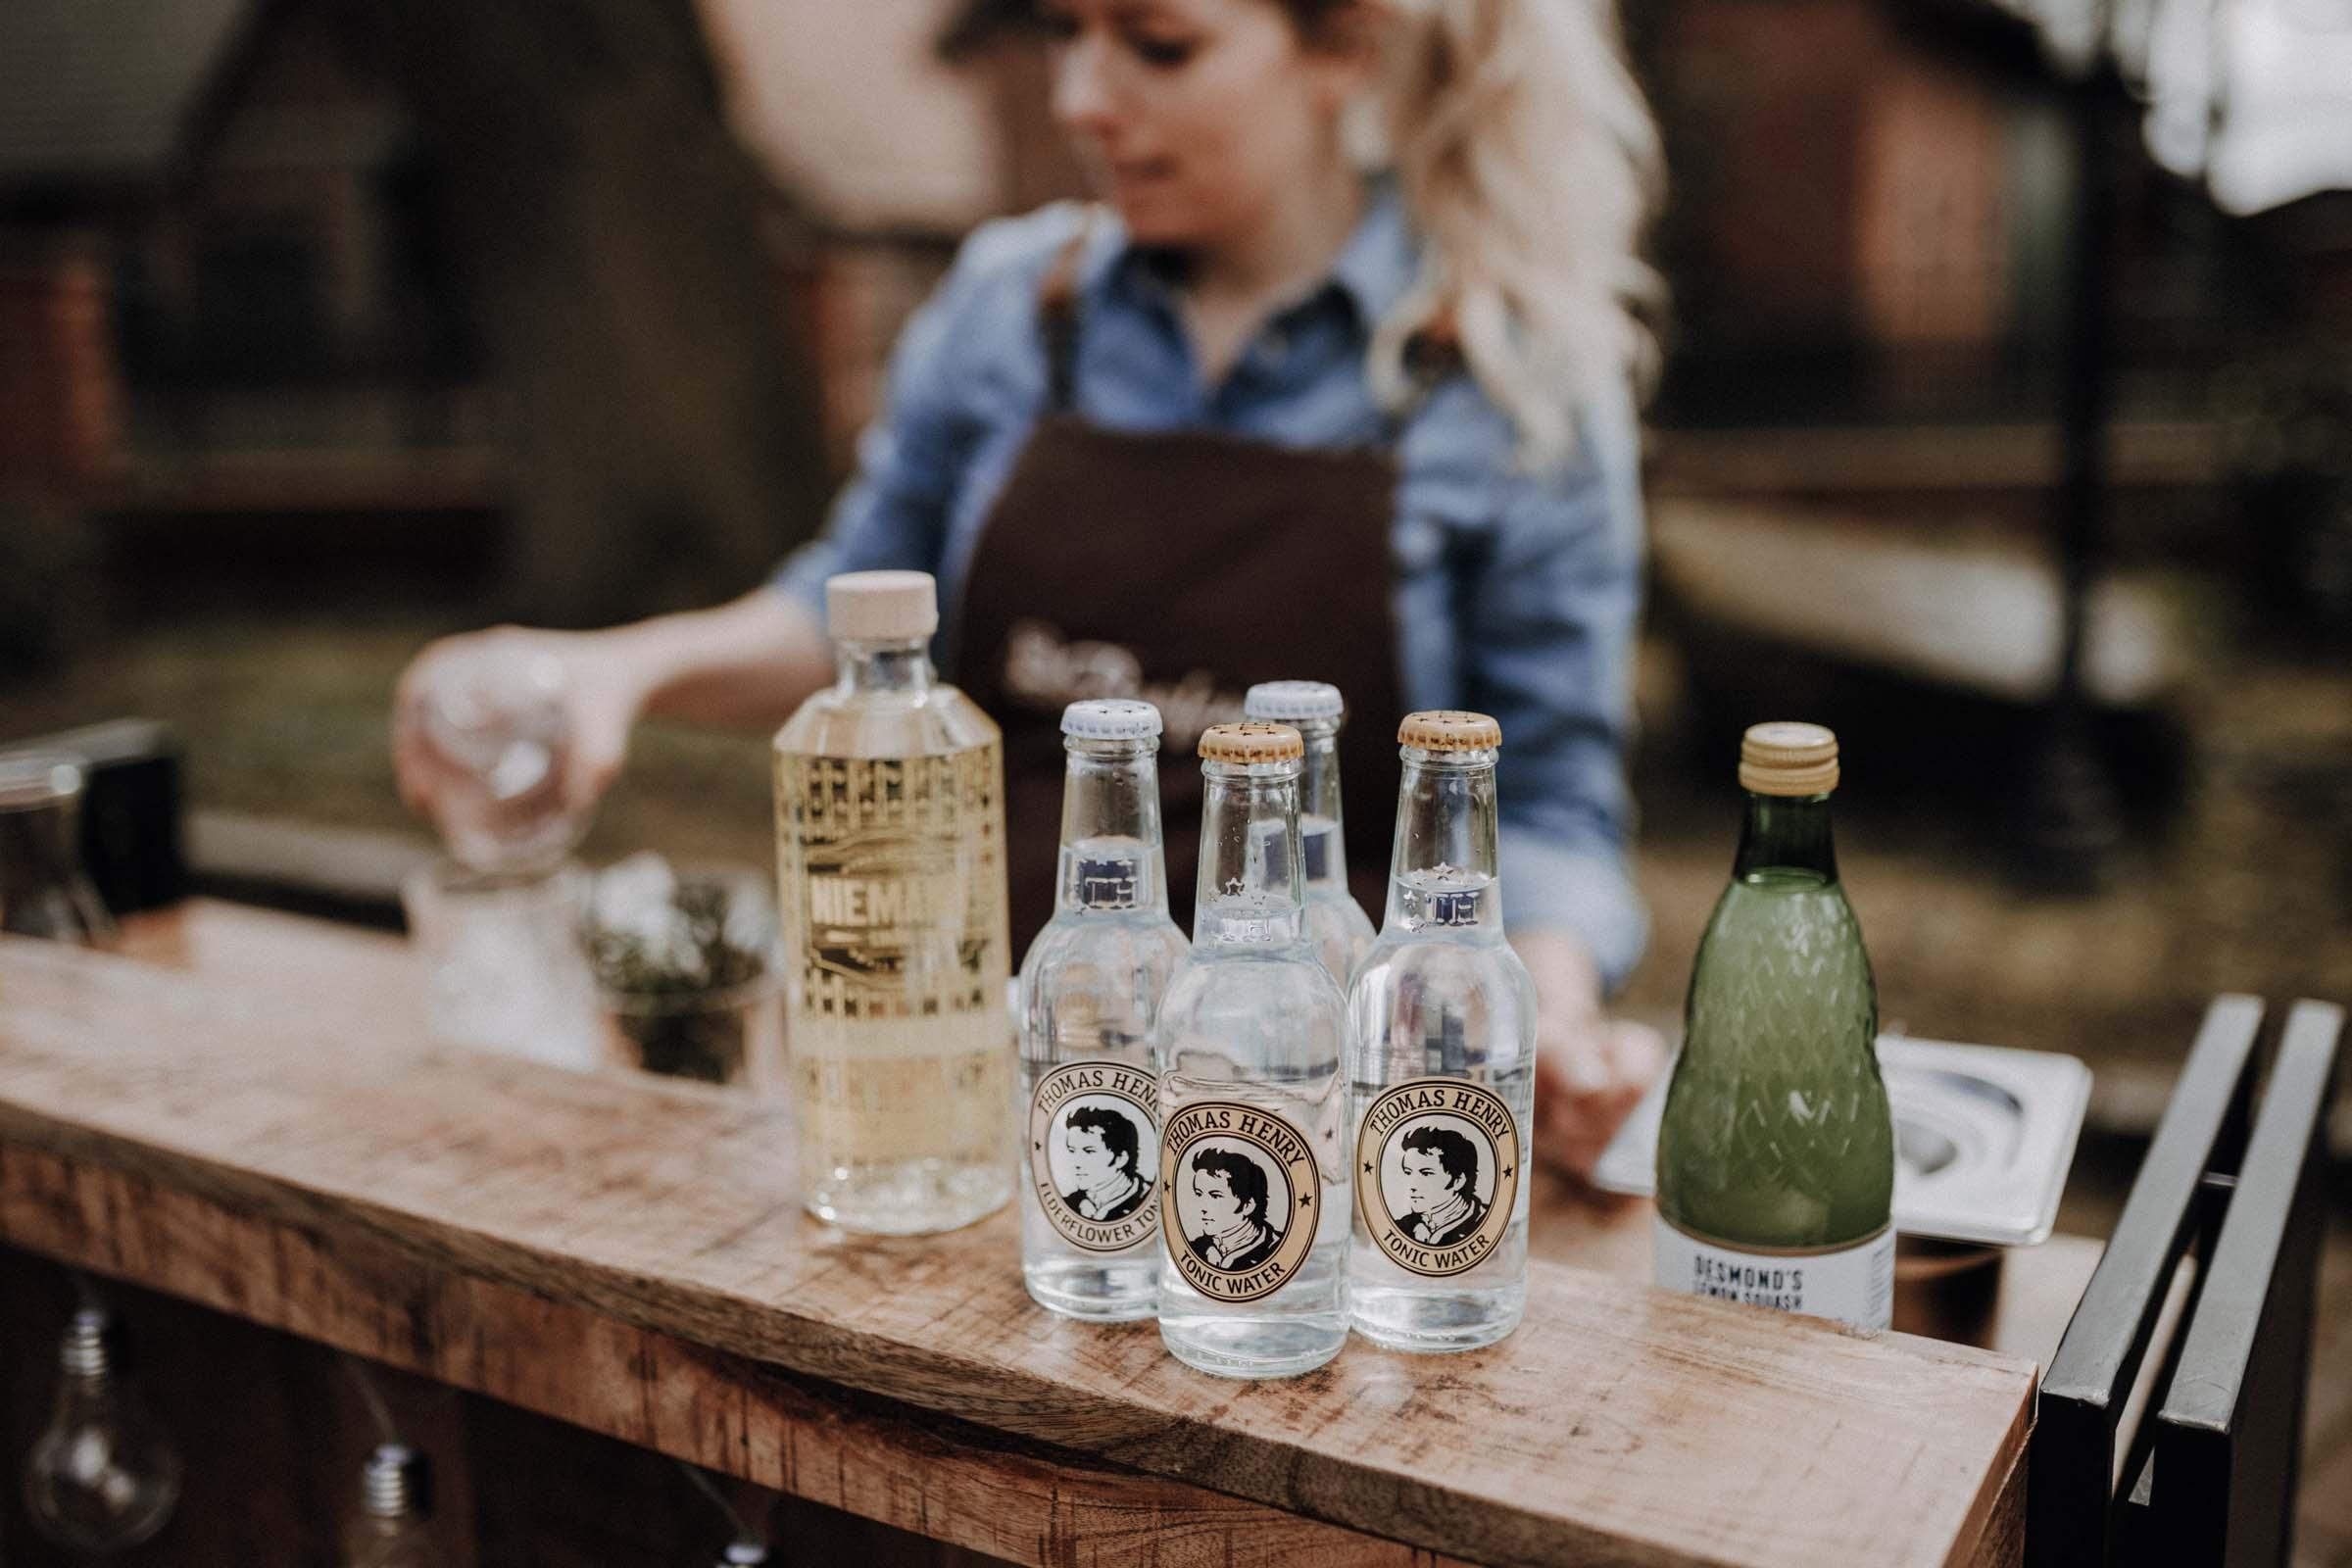 Mobile | Bar | VW | Bulli | Ape | Vespa | Cocktailservice | Cocktails | Bus | Catering | Hannover | Getränke | Foodtruck | Sektempfang | Standesamt | Geburtstag | Barkeeper | Hochzeit | Mieten | Event | Buchen